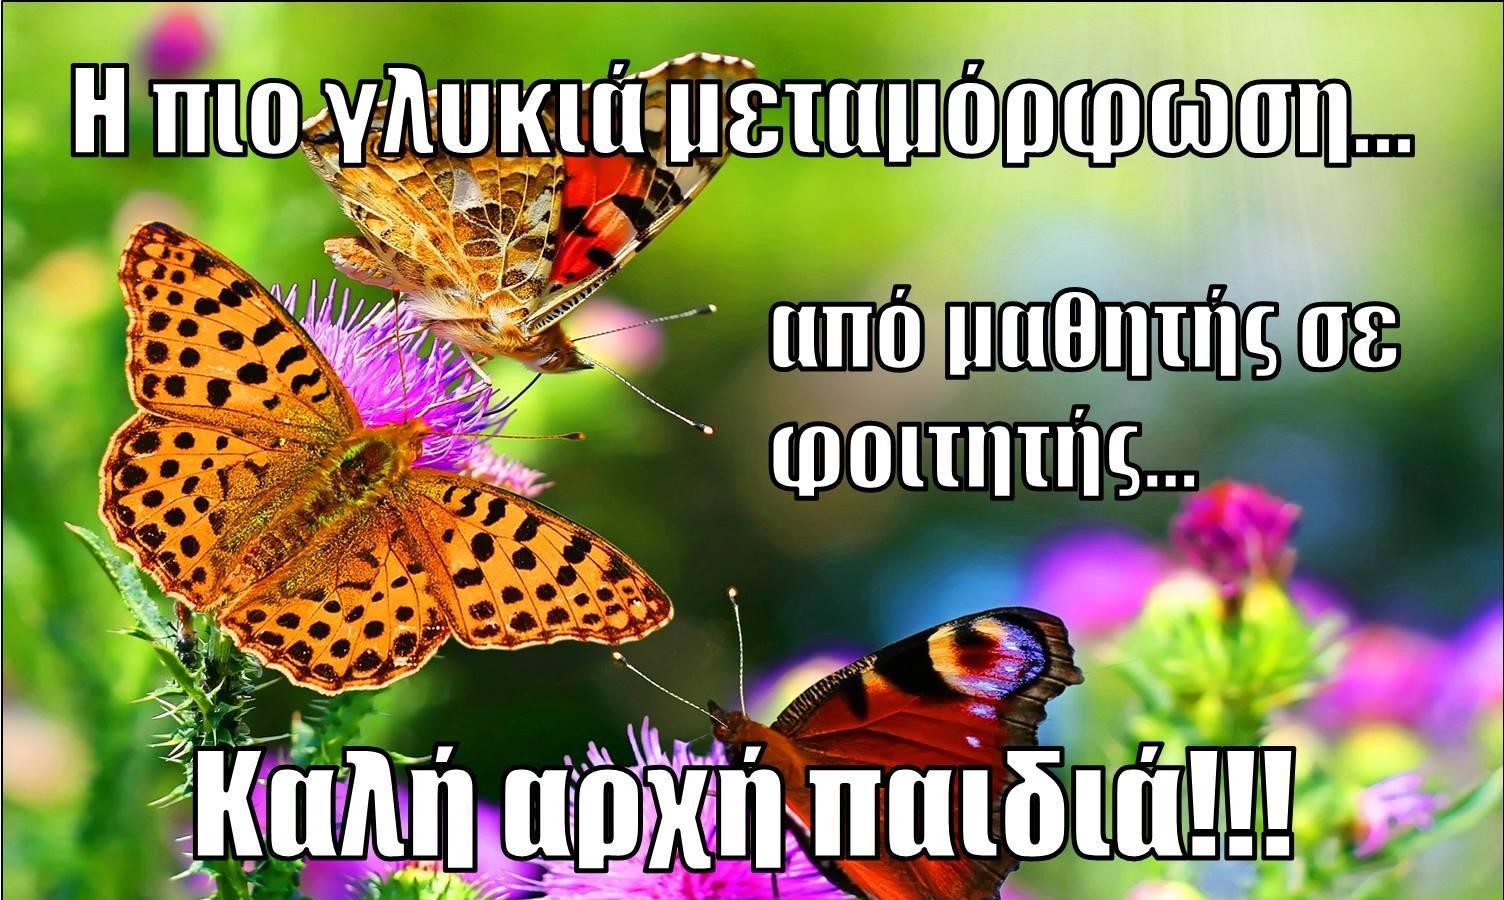 14138947_10210470615221231_1586311535_o